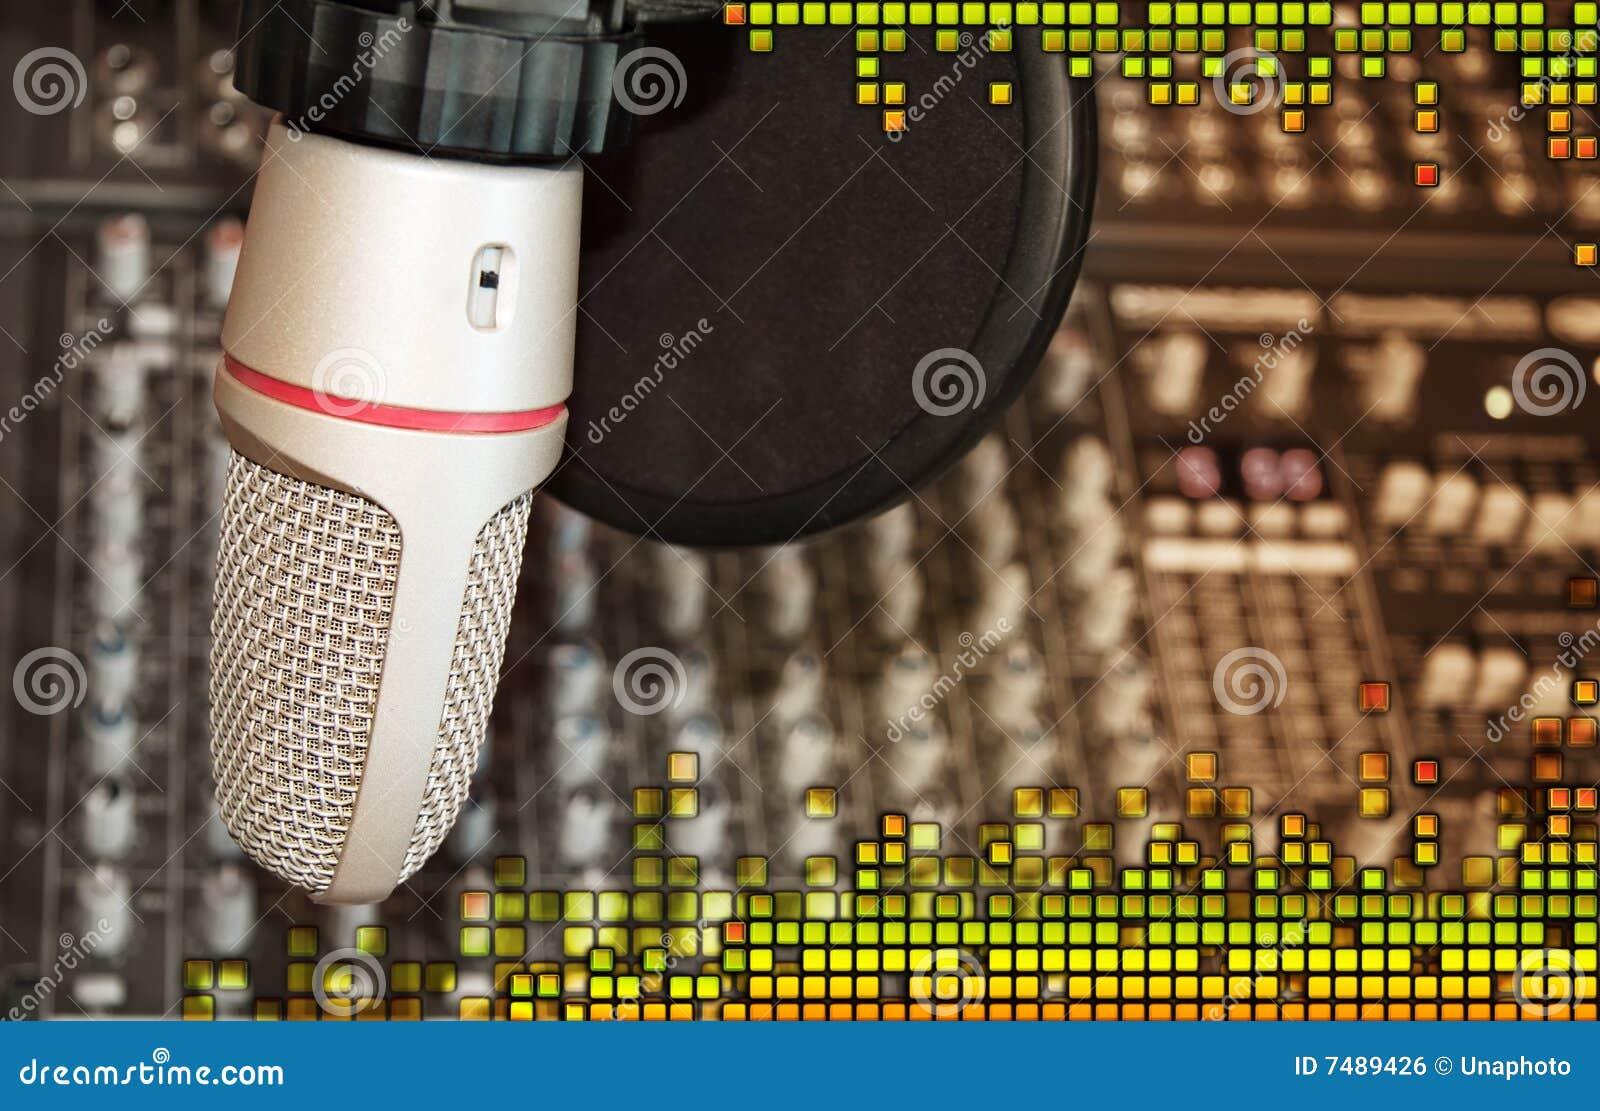 Digital Recorders - Audio